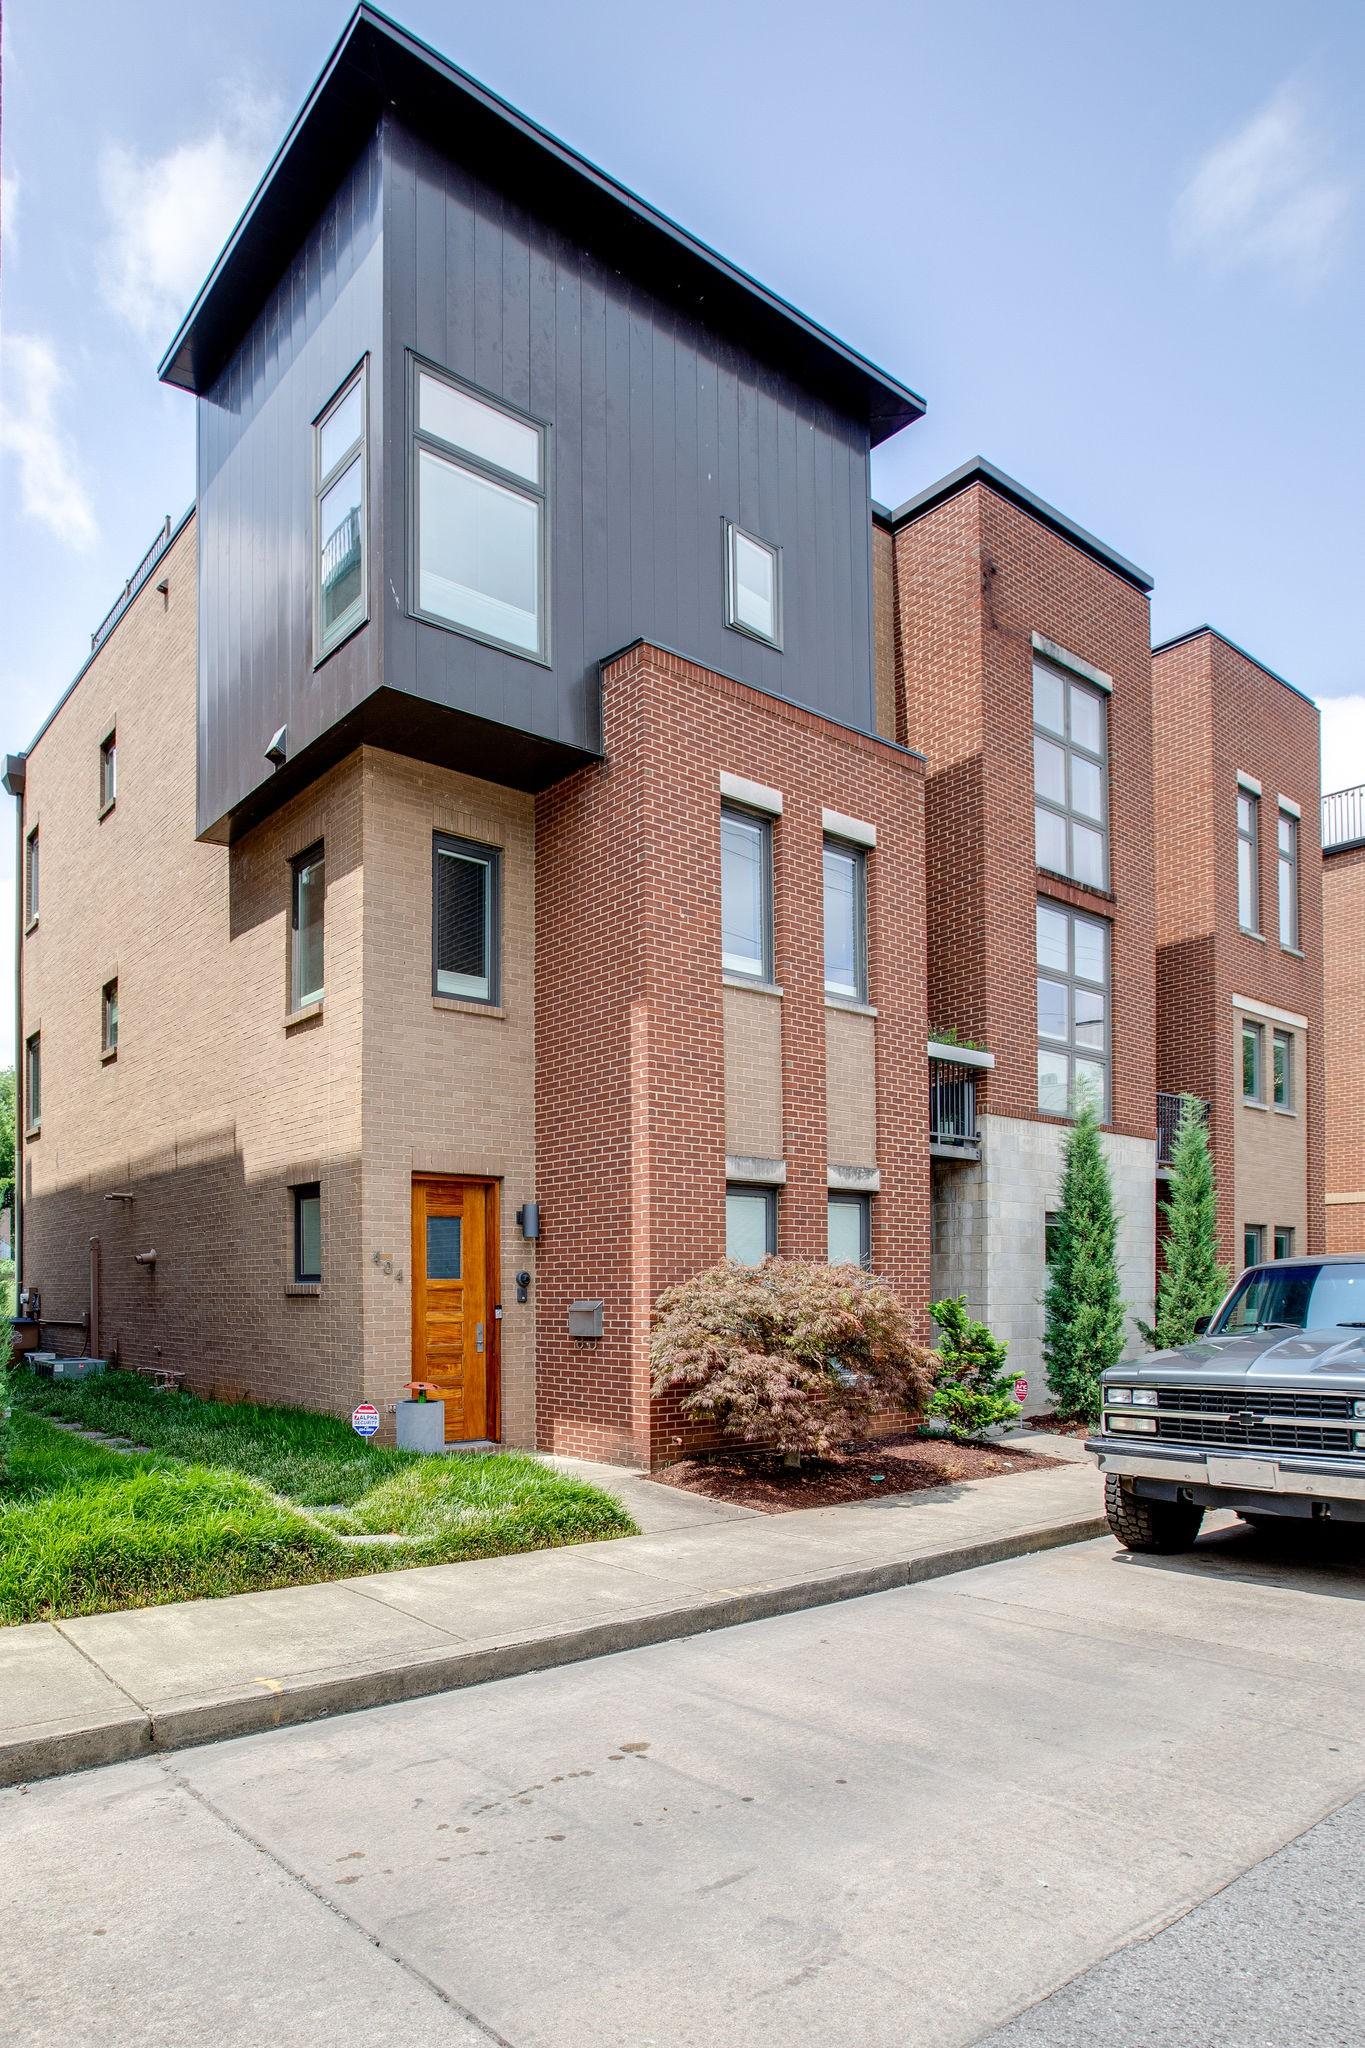 404 Van Buren St, Nashville, TN 37208 - Nashville, TN real estate listing